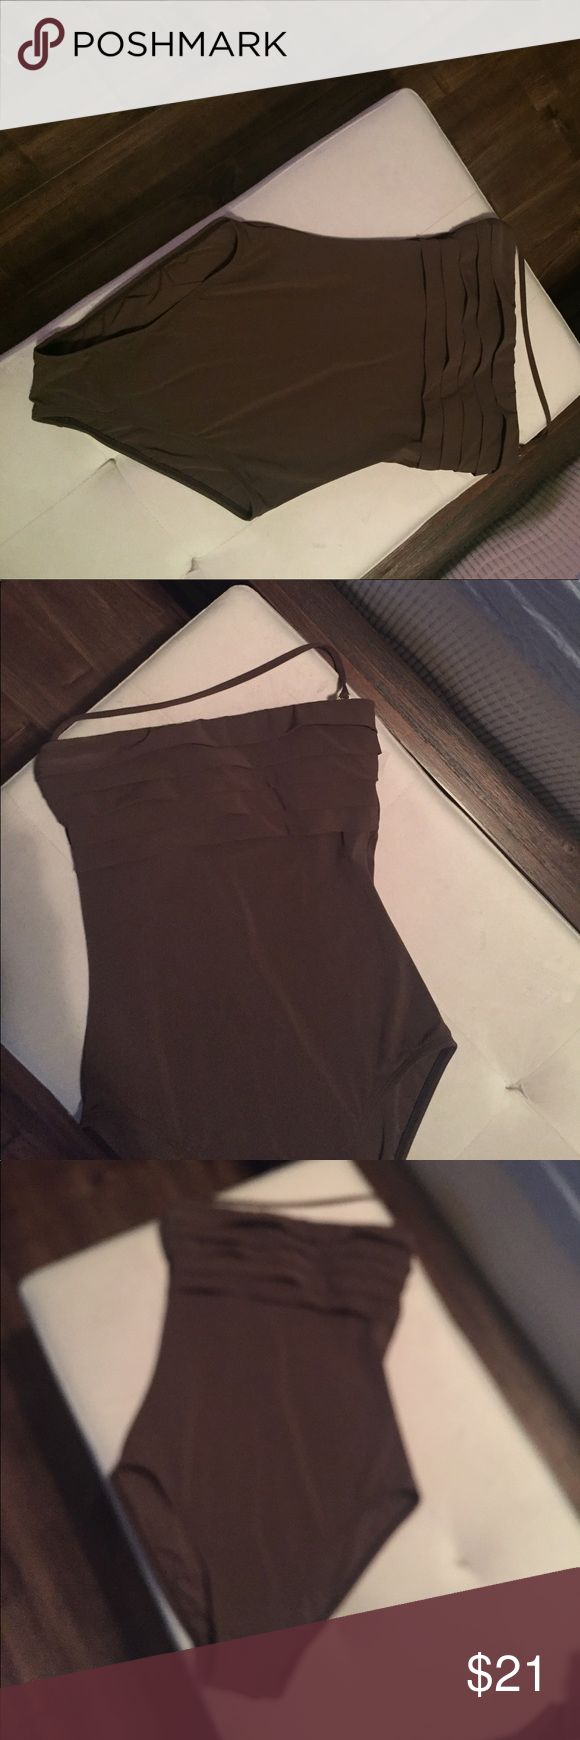 La Blanca by Rod Beattie one piece swimsuit brown One piece good condition removable strap La Blanca Swim One Pieces